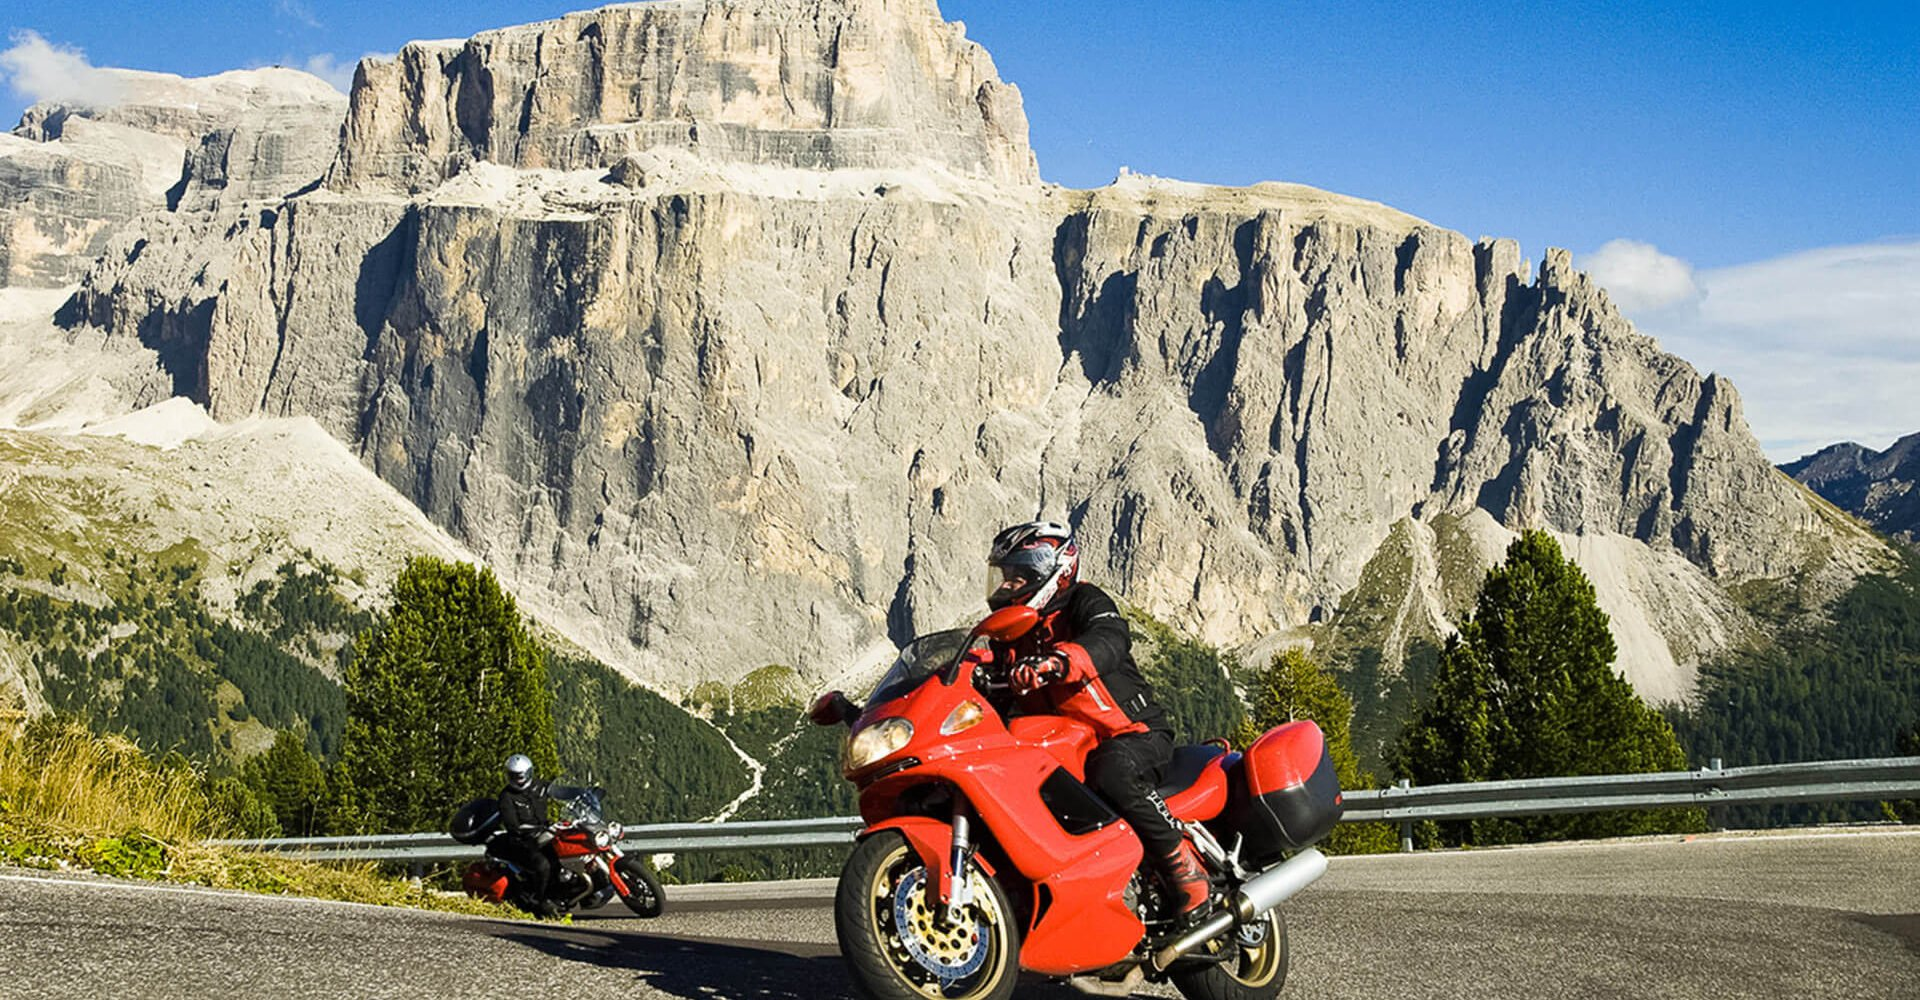 Motorrad Hotel Südtirol: Unbegrenzter Kurvenspaß in den Dolomiten